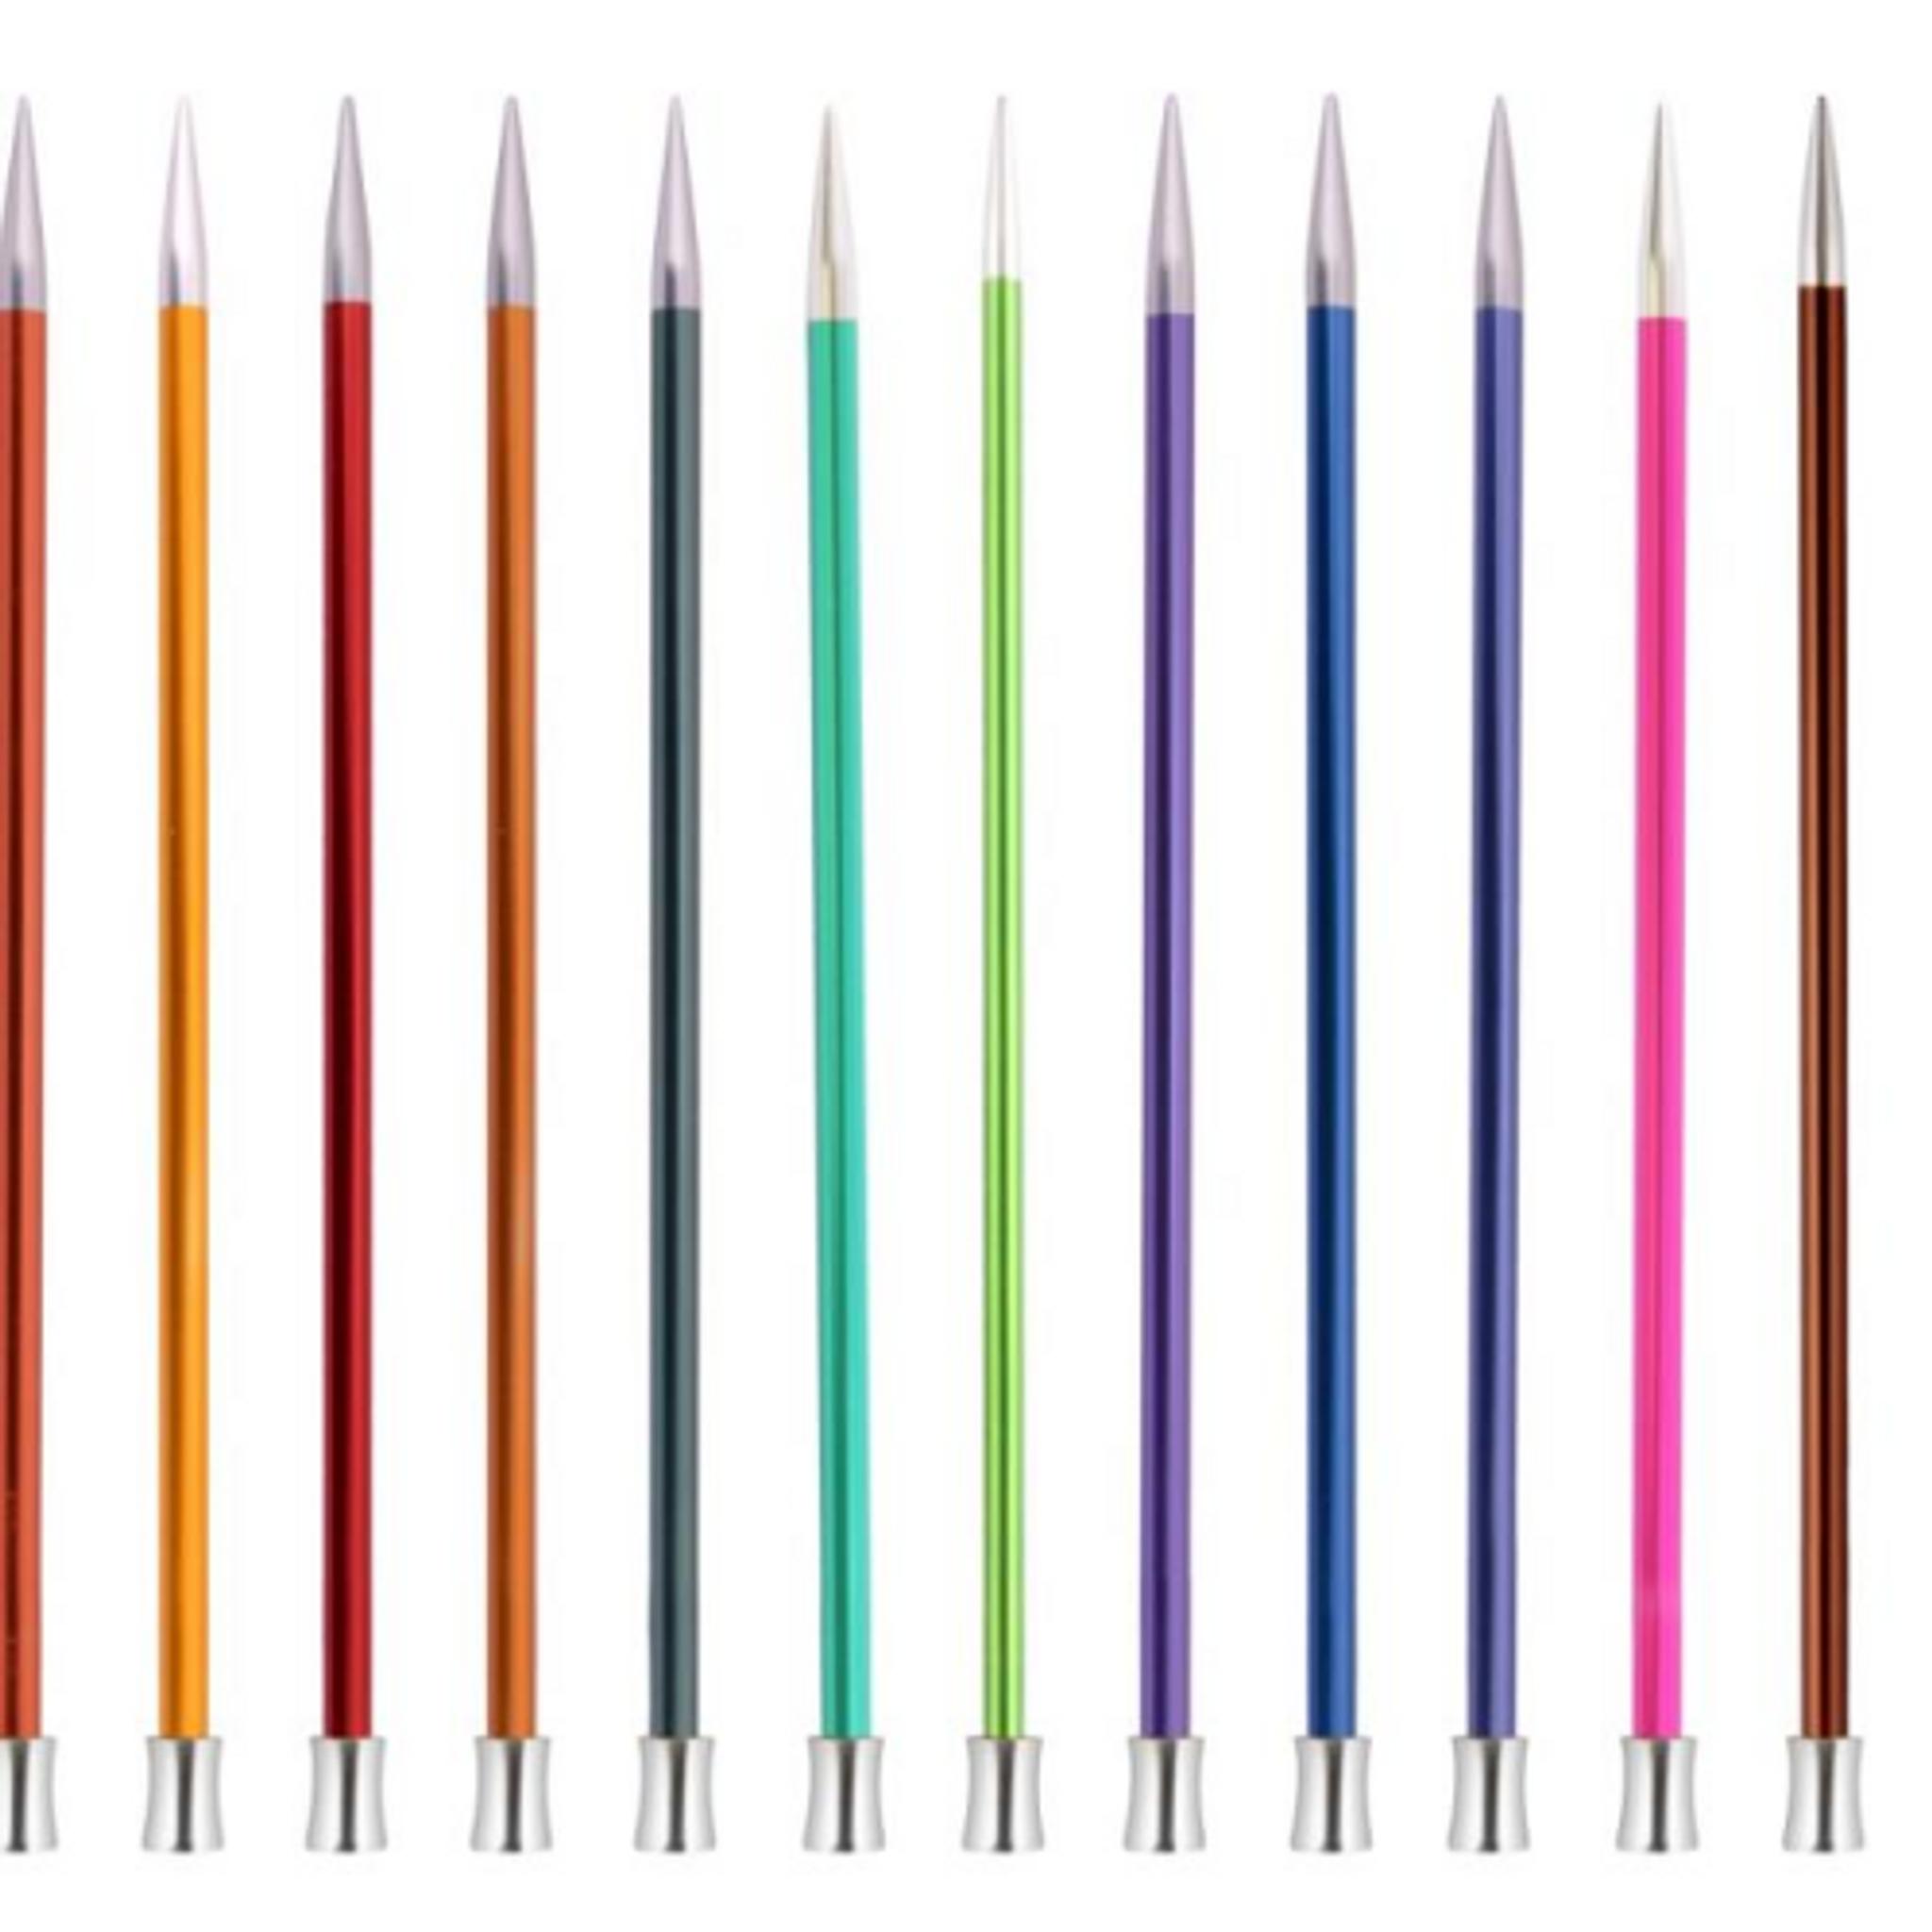 40cm Length KnitPro Symfonie Wood Straight Single Point Knitting Needles